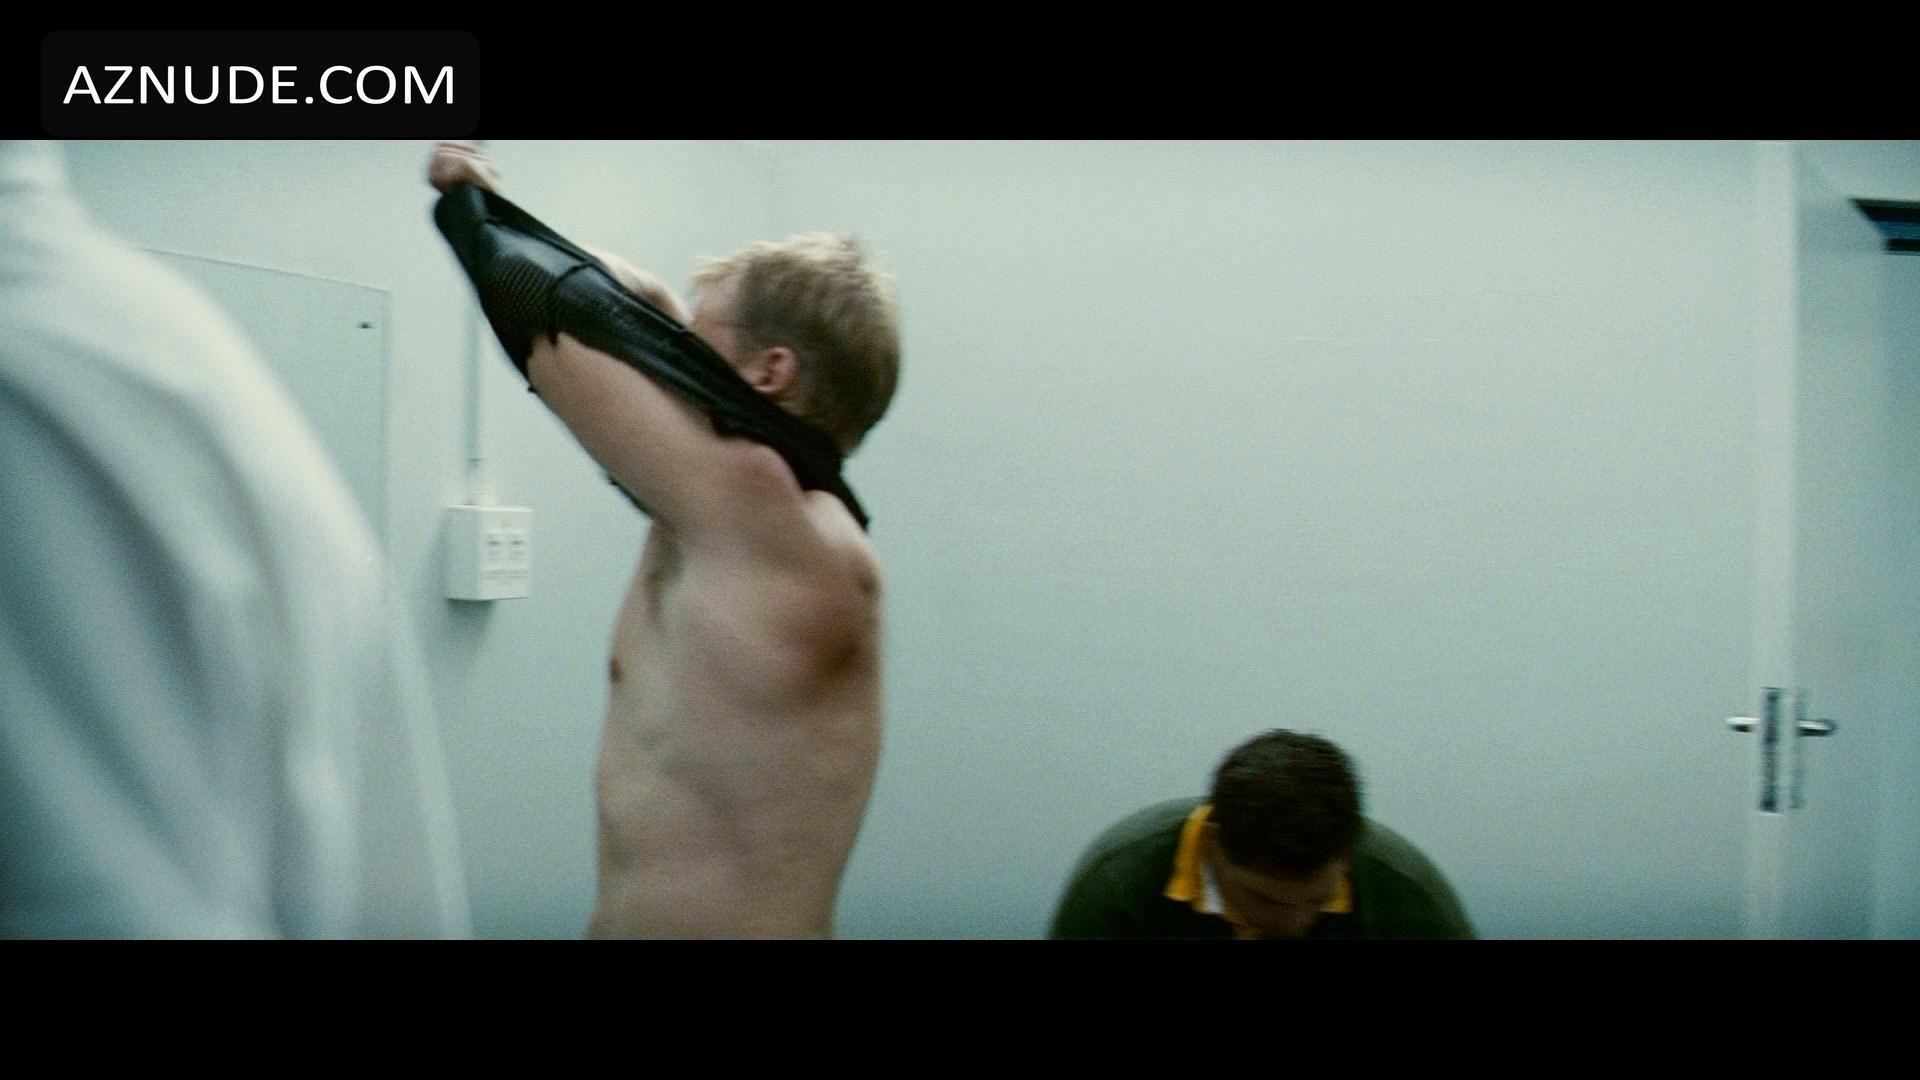 Nude Brendan Fraser Naked Pictures